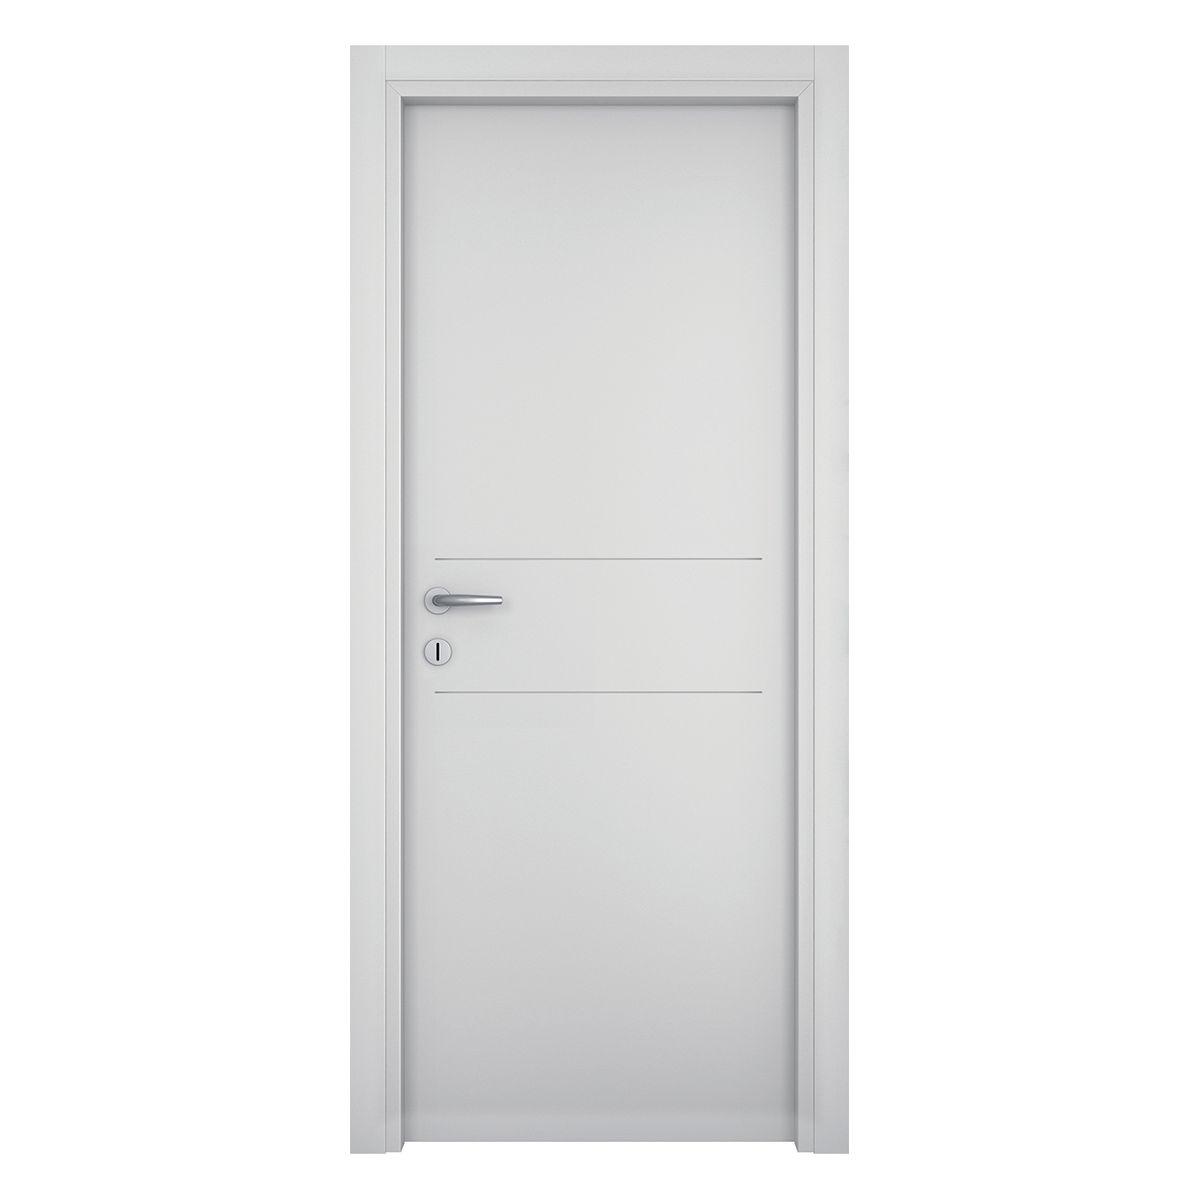 Porta a soffietto leroy merlin porta doccia battente elyt - Leroy merlin porta scorrevole ...